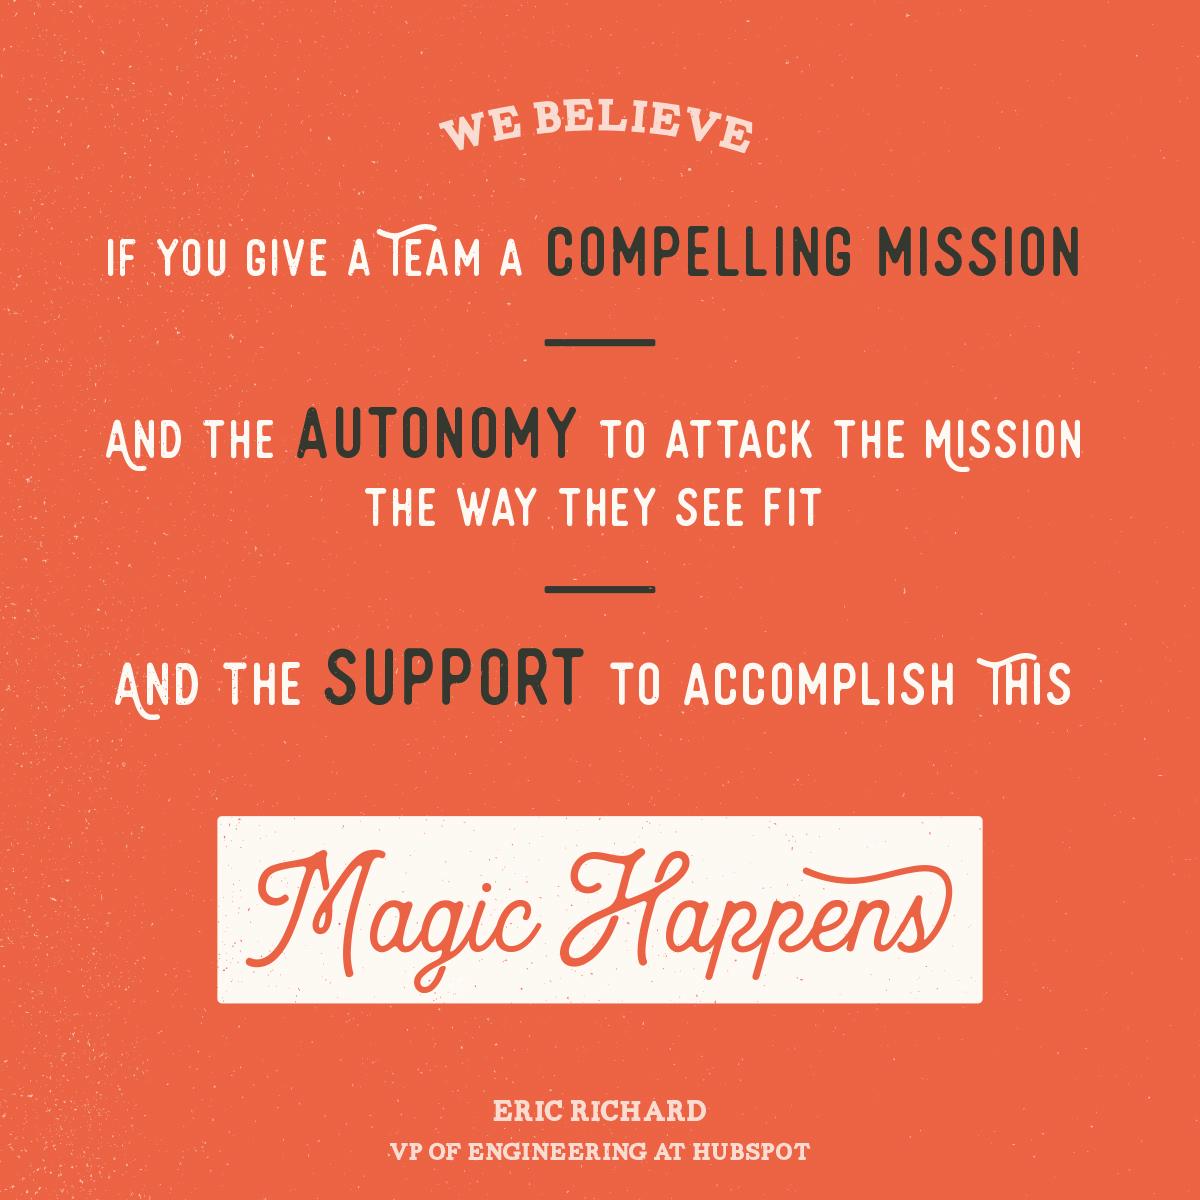 magic_happens-1.jpg